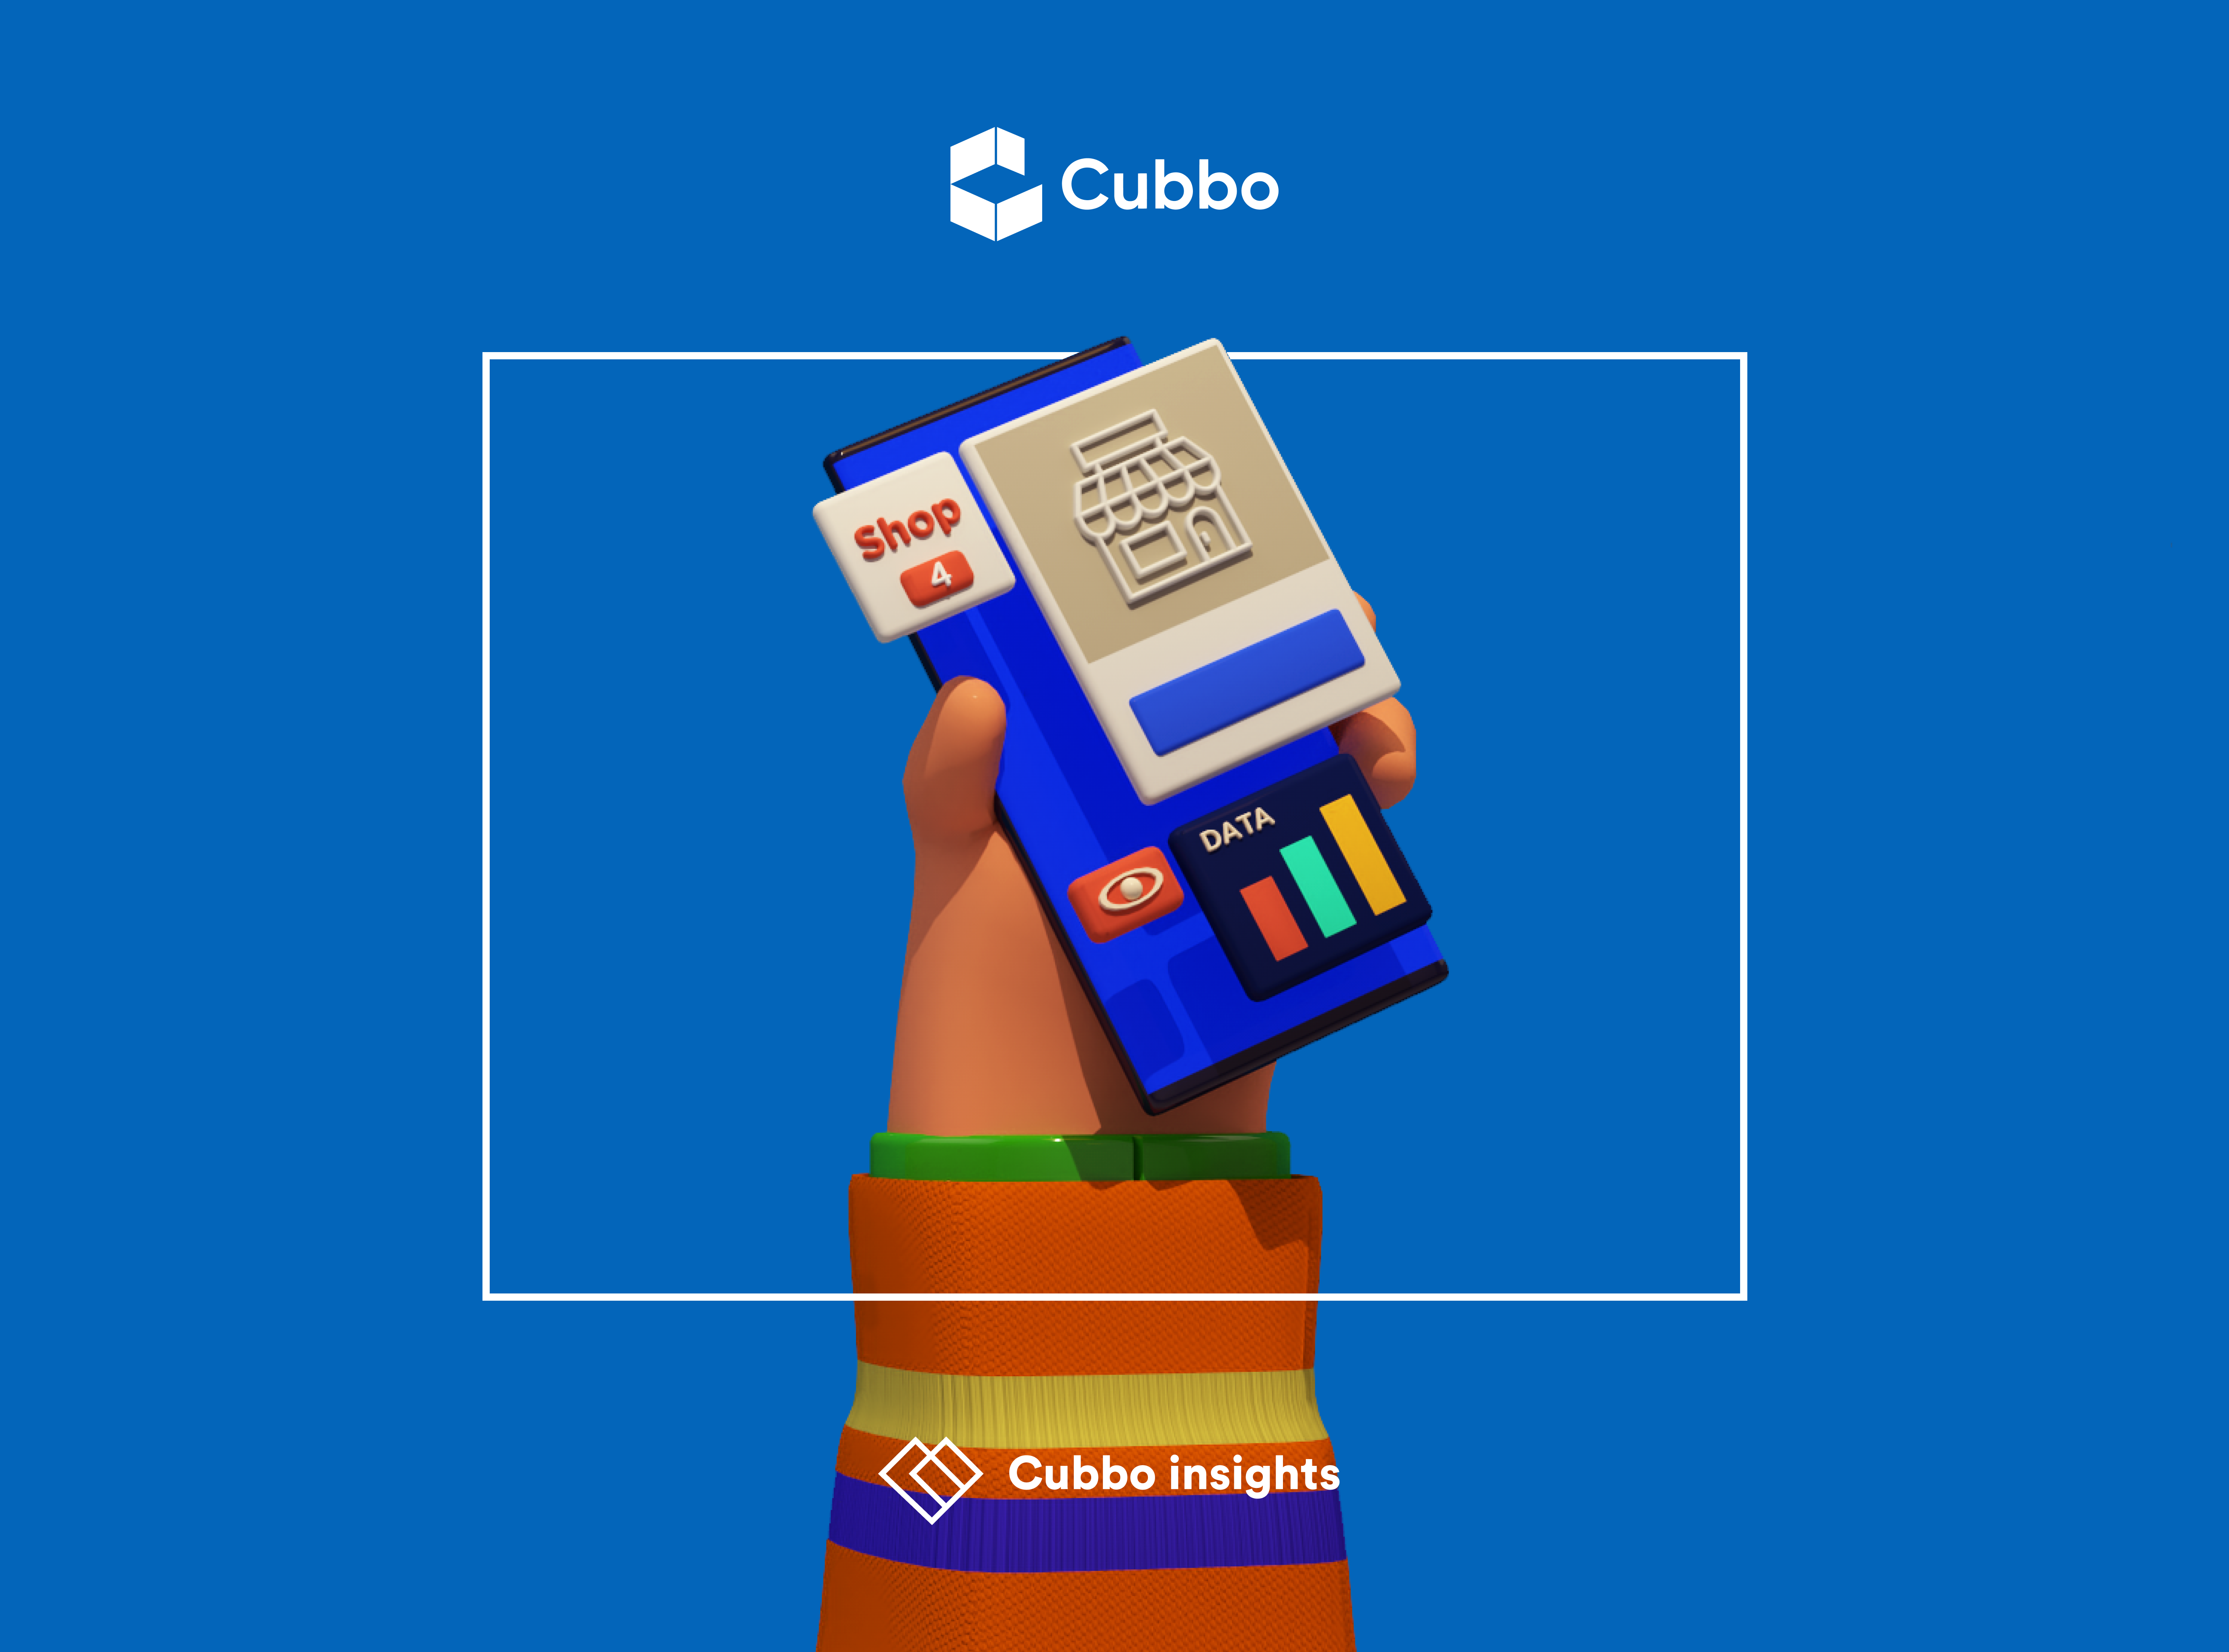 Cubbo - most recent blog post HERO image